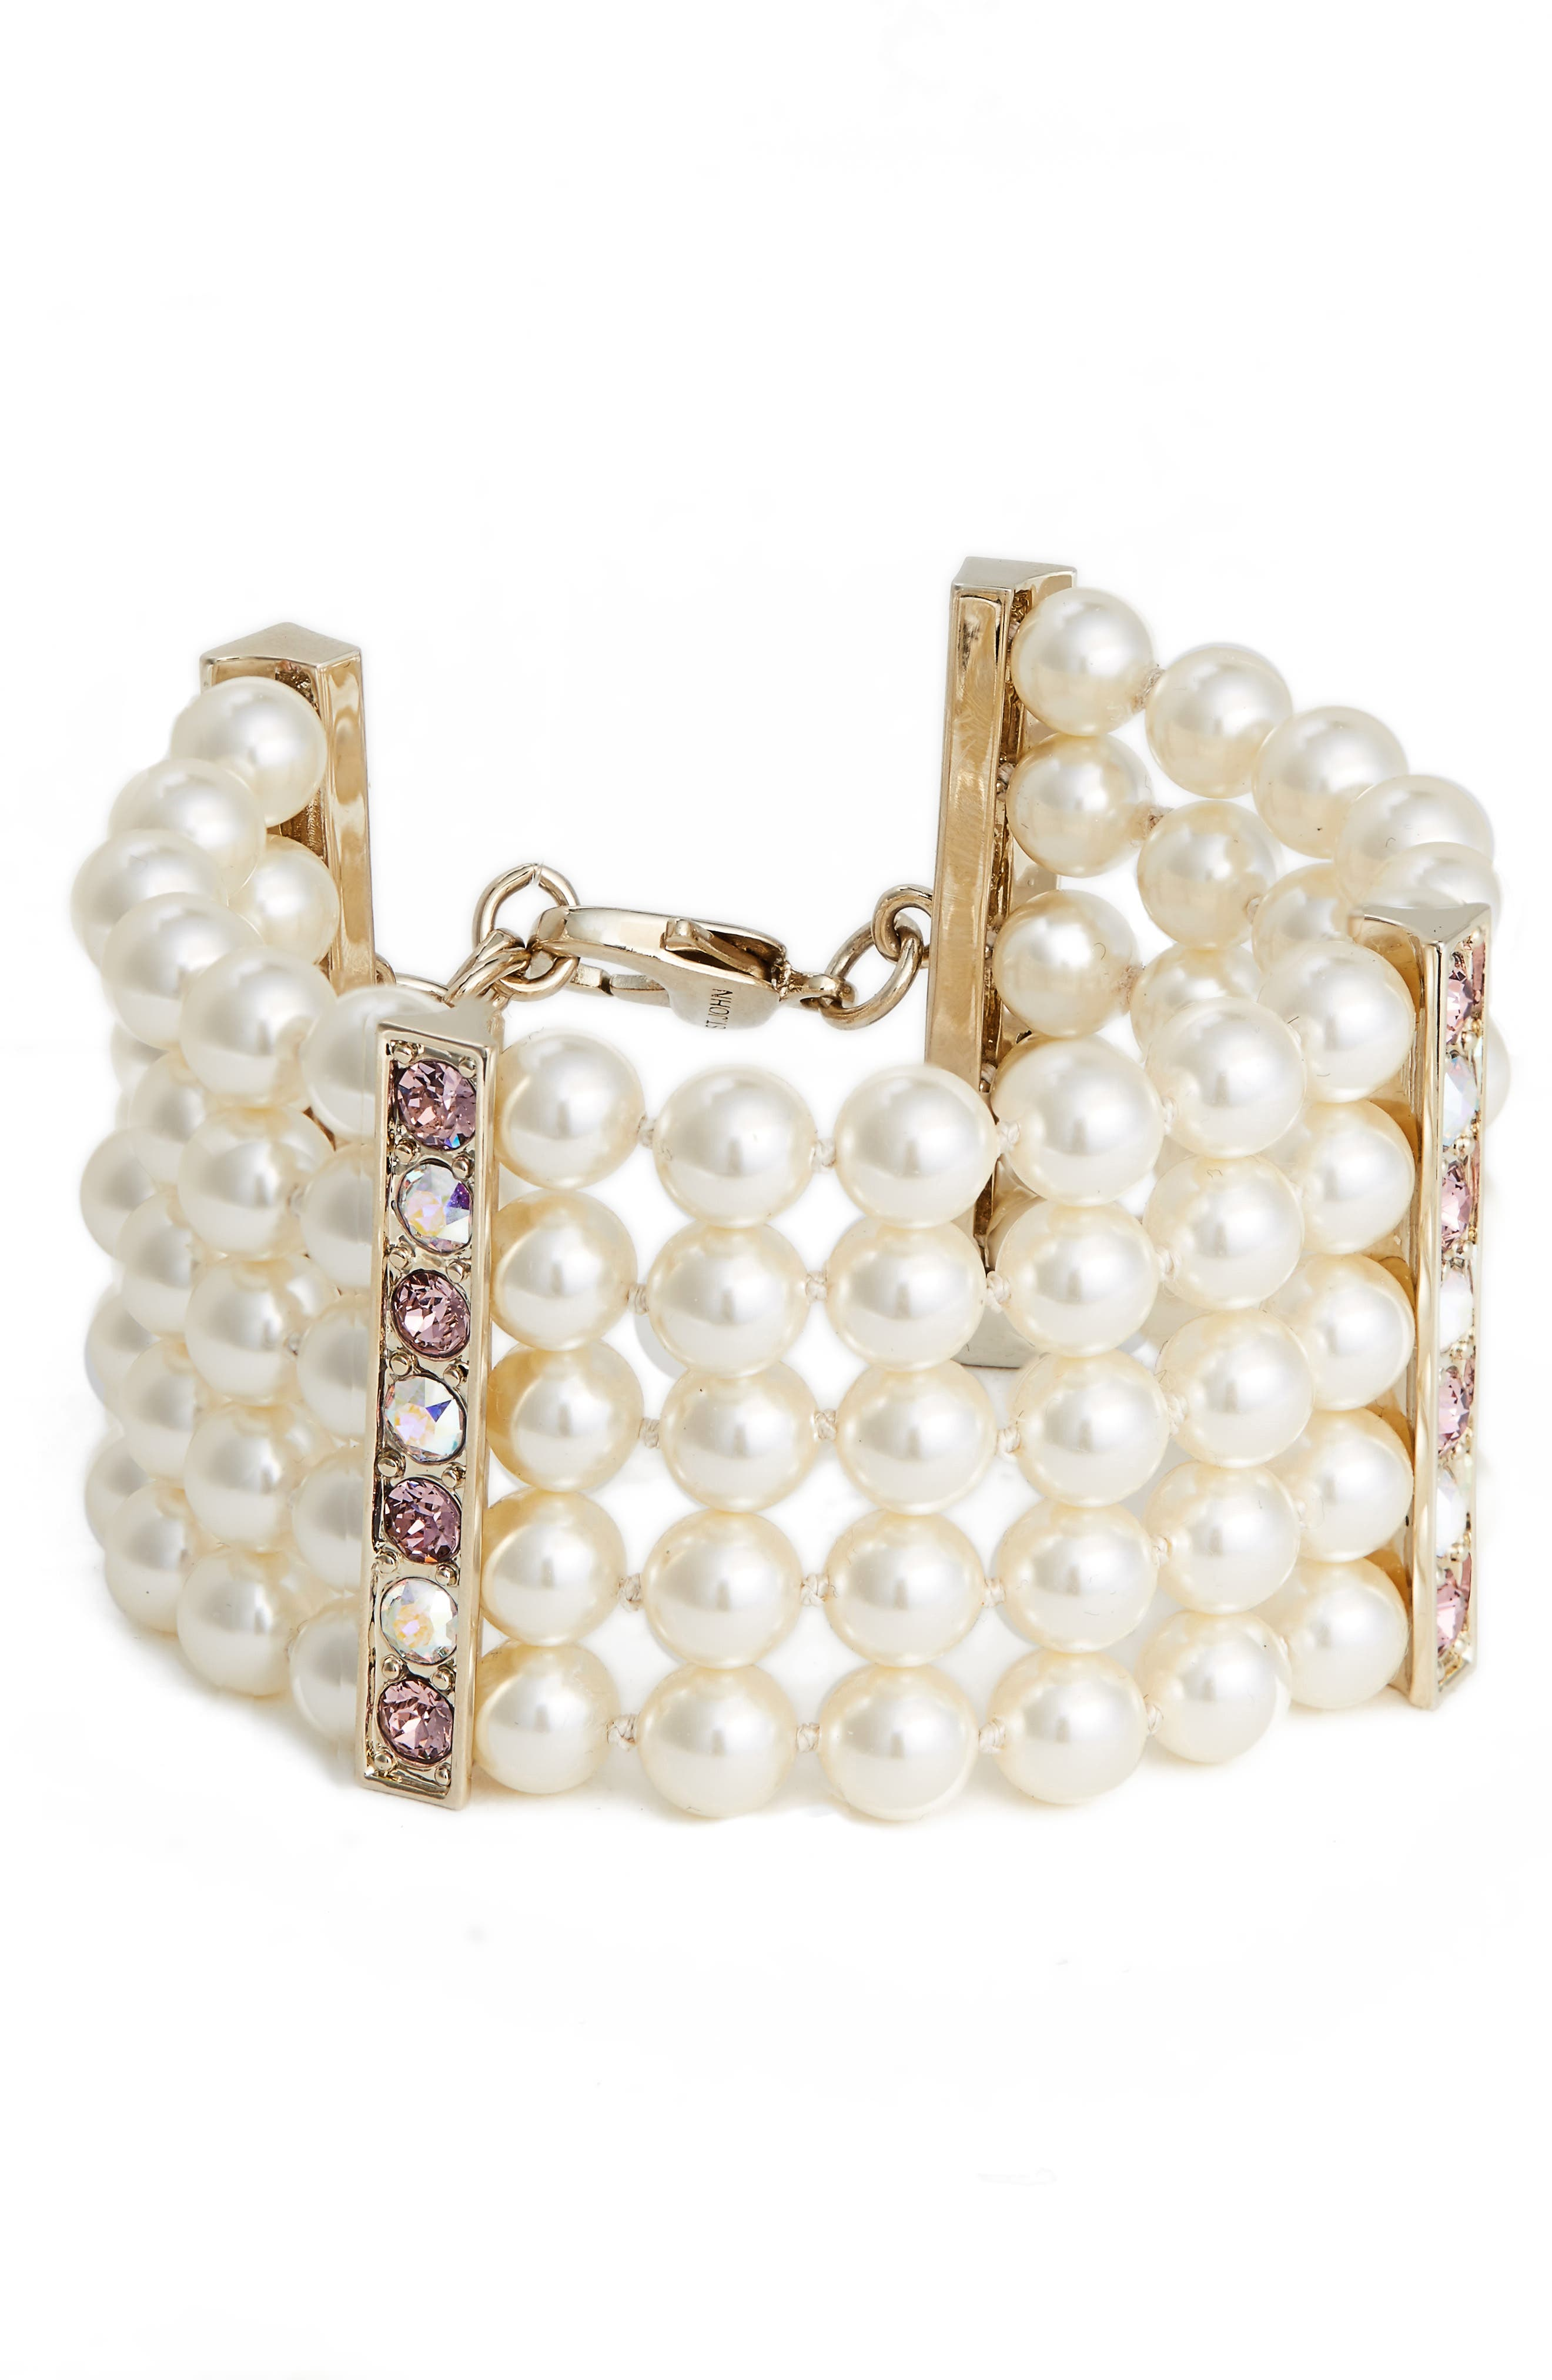 Swarovski Imitation Pearl & Crystal Bracelet,                             Main thumbnail 1, color,                             710